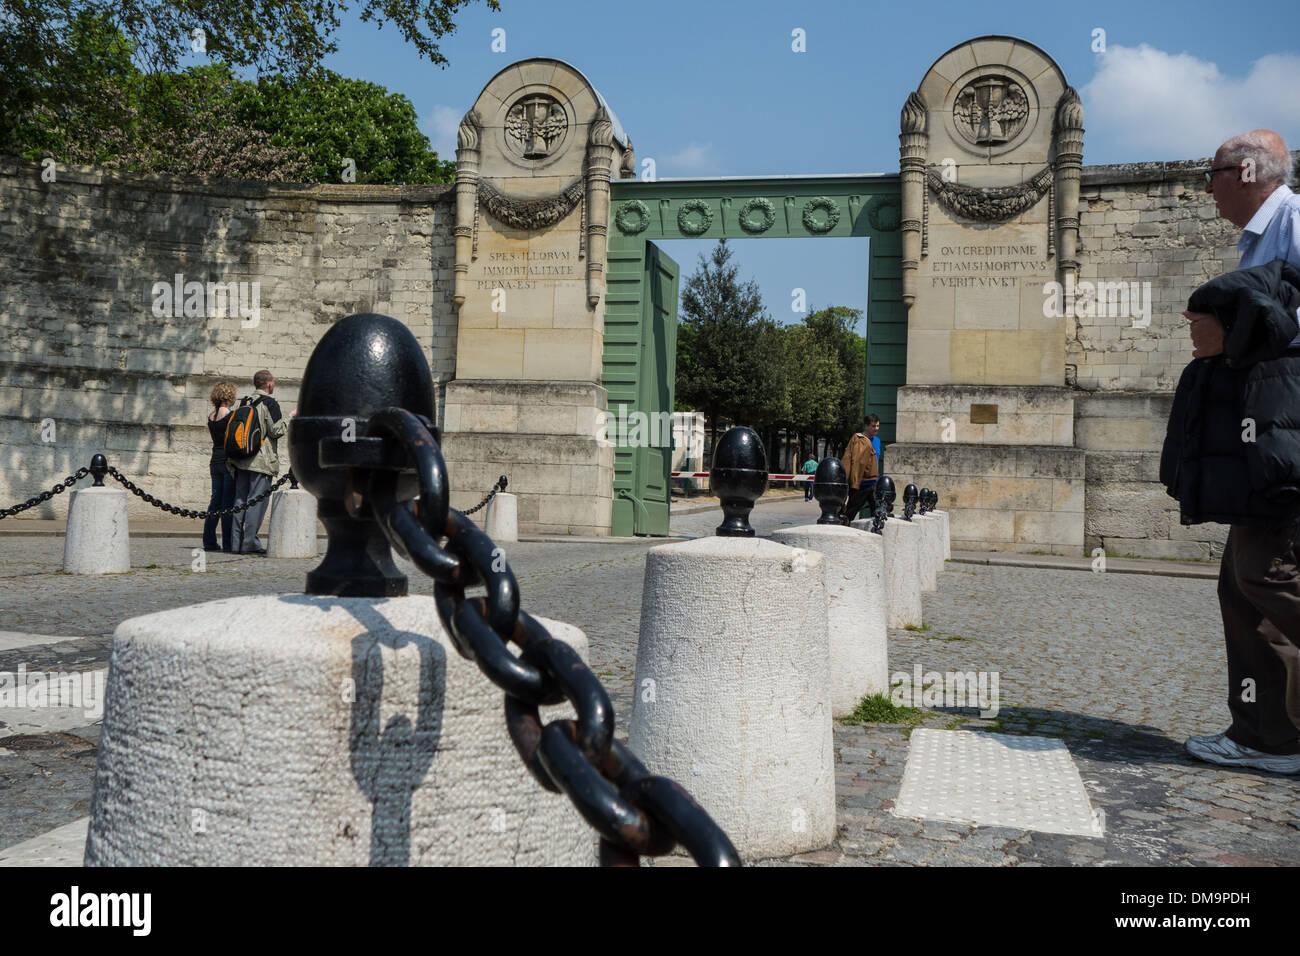 MAIN ENTRANCE TO PERE-LACHAISE CEMETERY, PARIS 20TH ARRONDISSEMENT, FRANCE - Stock Image